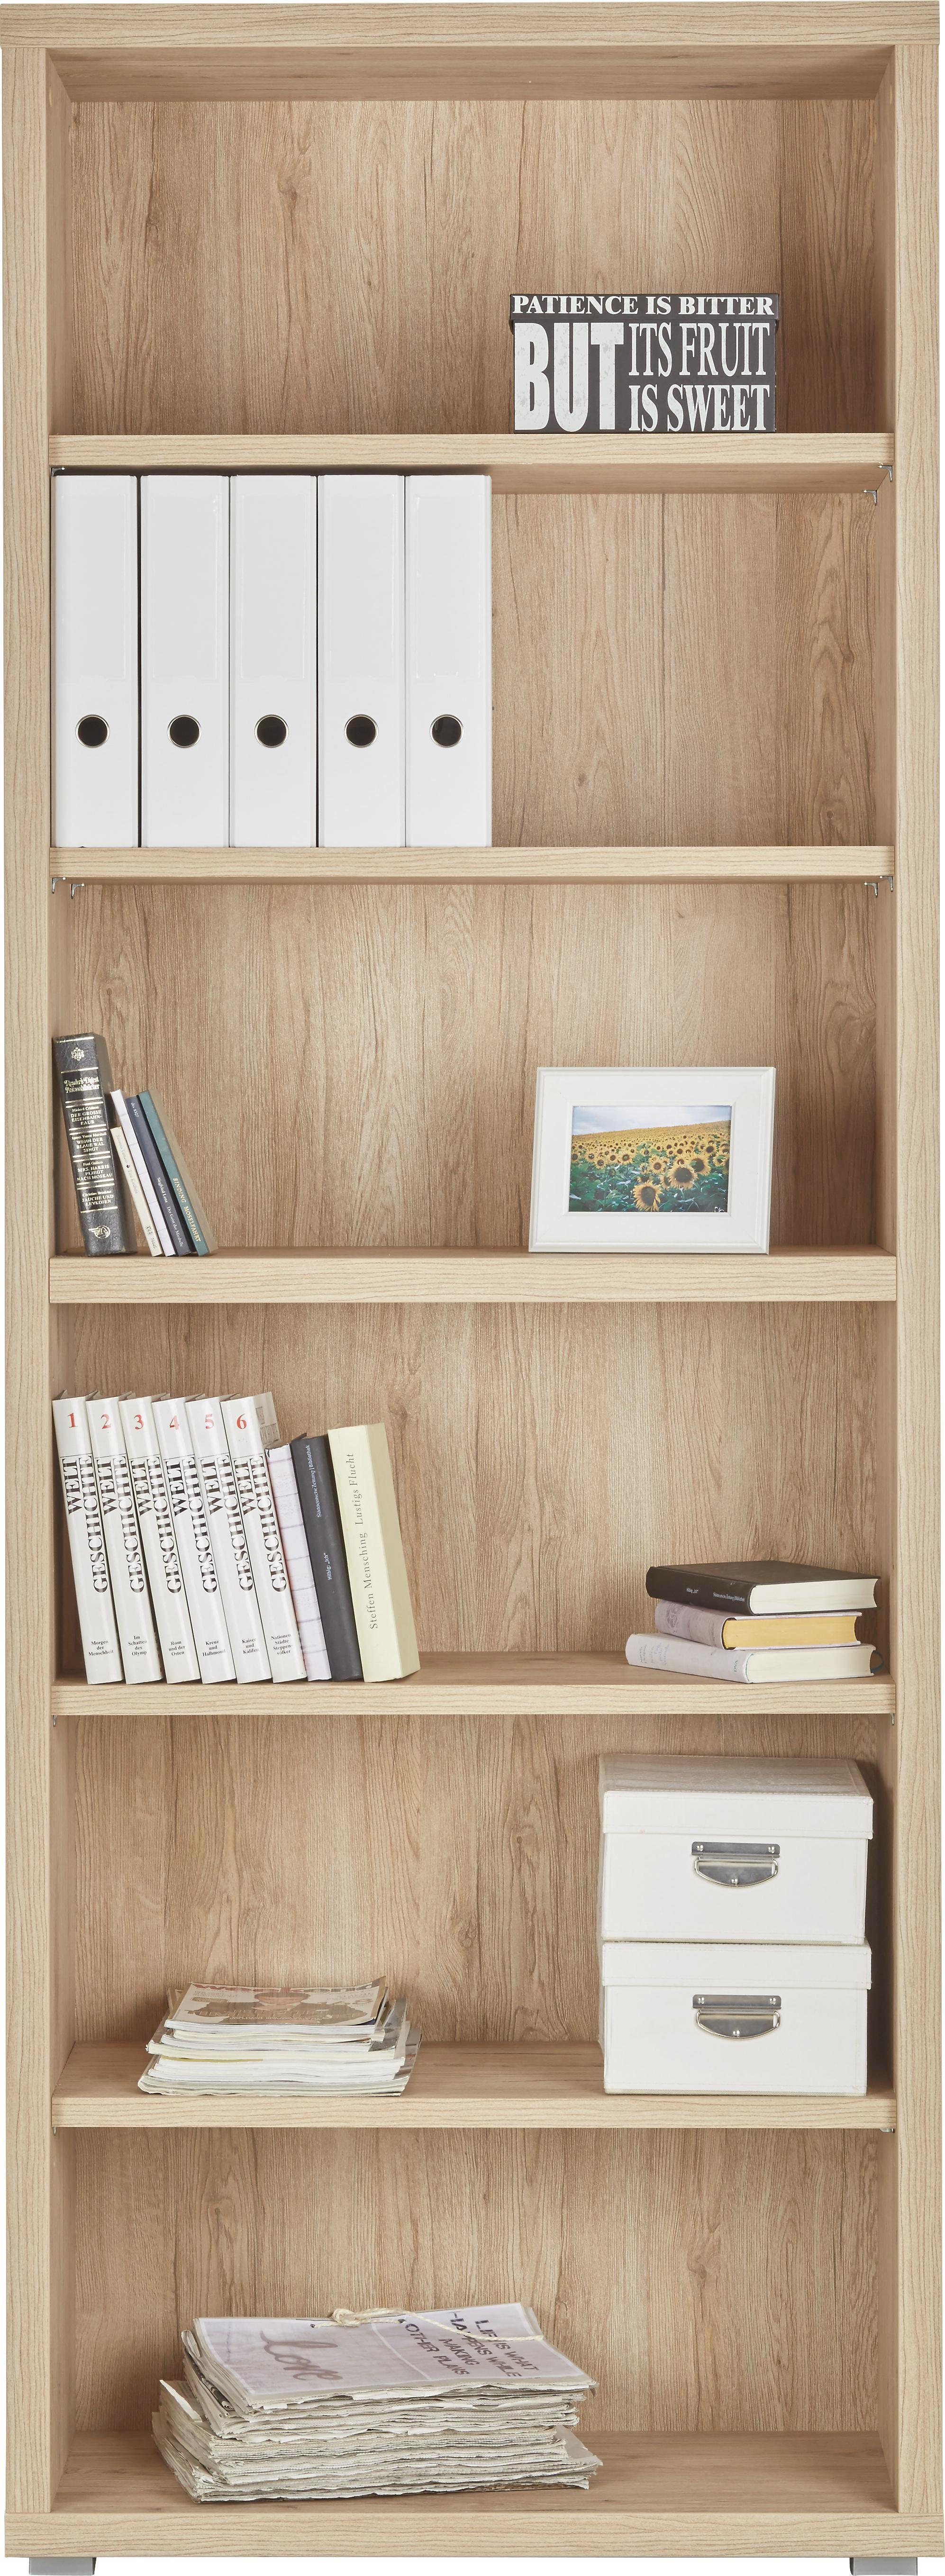 Regal In Sanremo Eiche - MODERN, Holz (80/220/36cm) - MÖMAX modern living